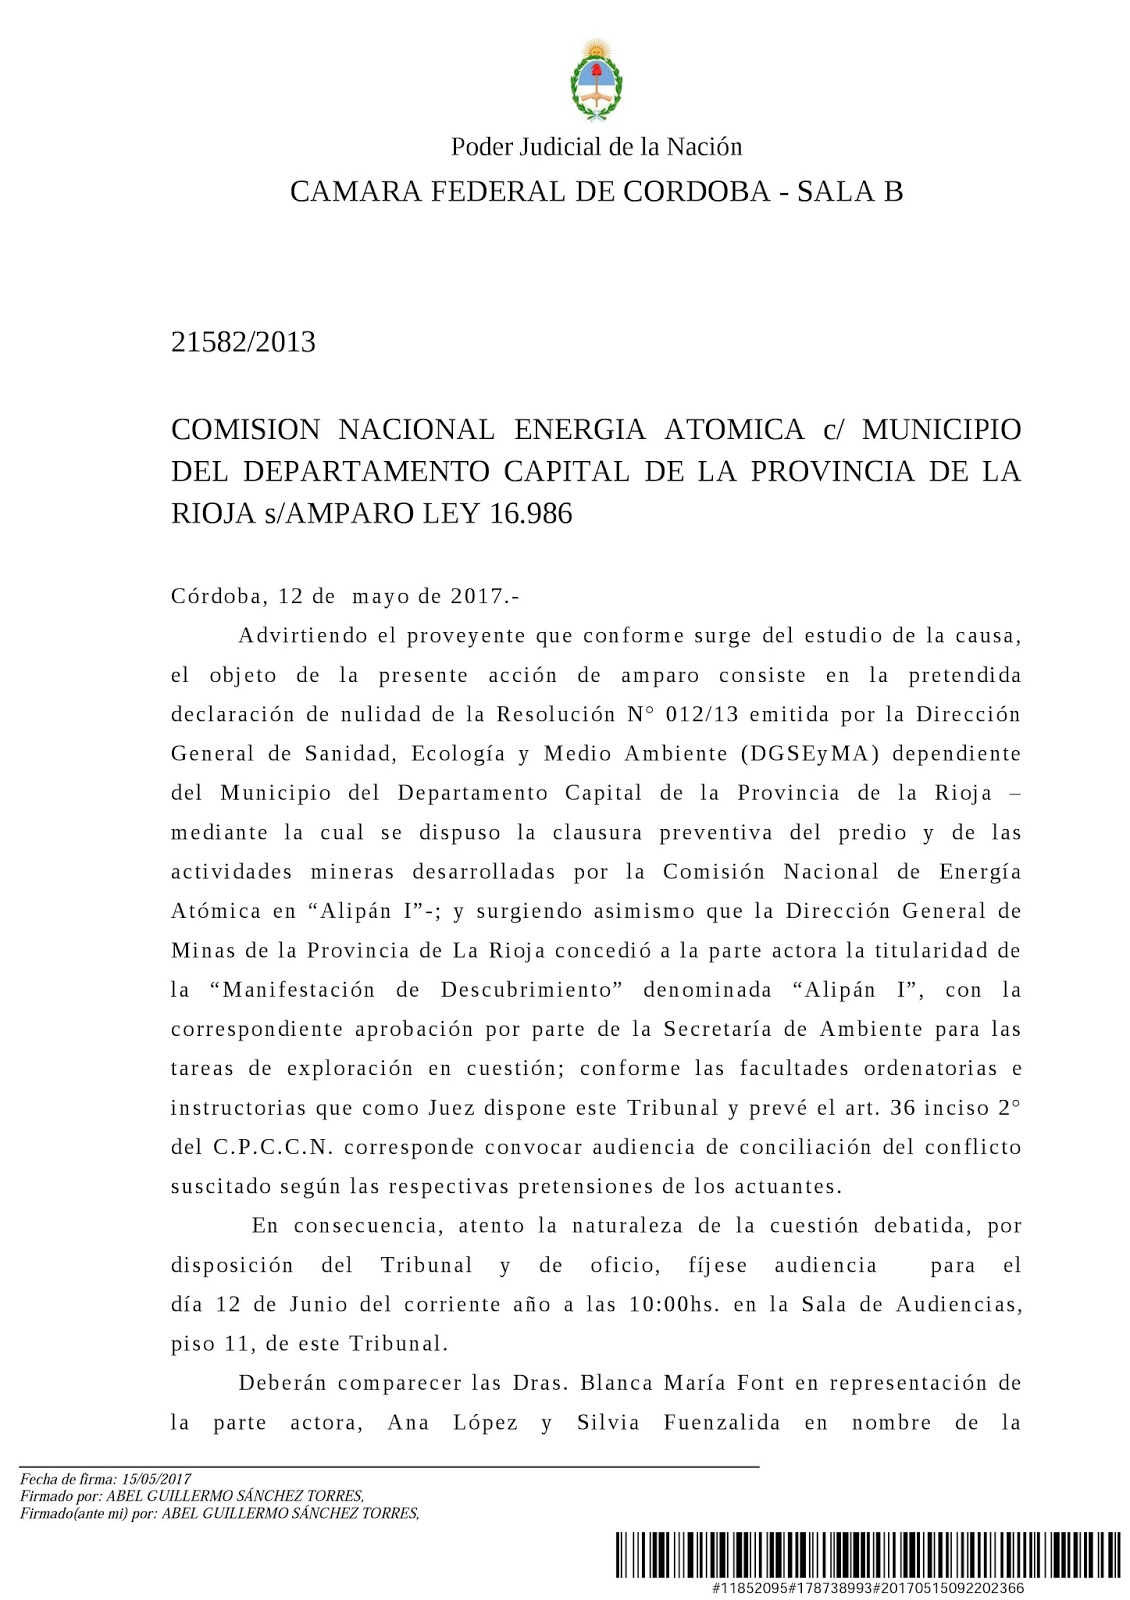 COMUNICADOS DE PRENSA Y DOCUMENTOS